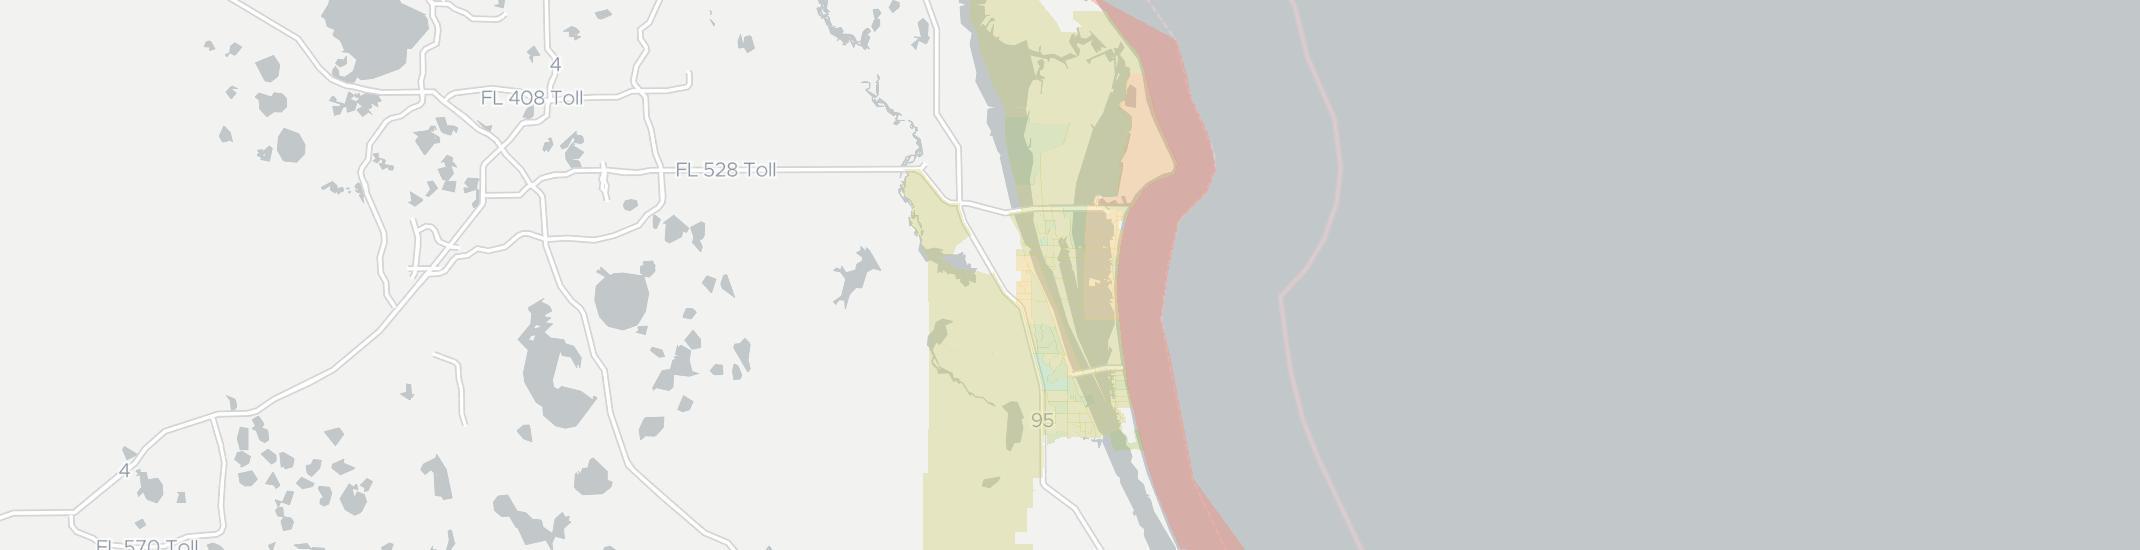 Map Of Merritt Island Florida.Merritt Island Fl Has 15 Internet Service Providers From 44 99